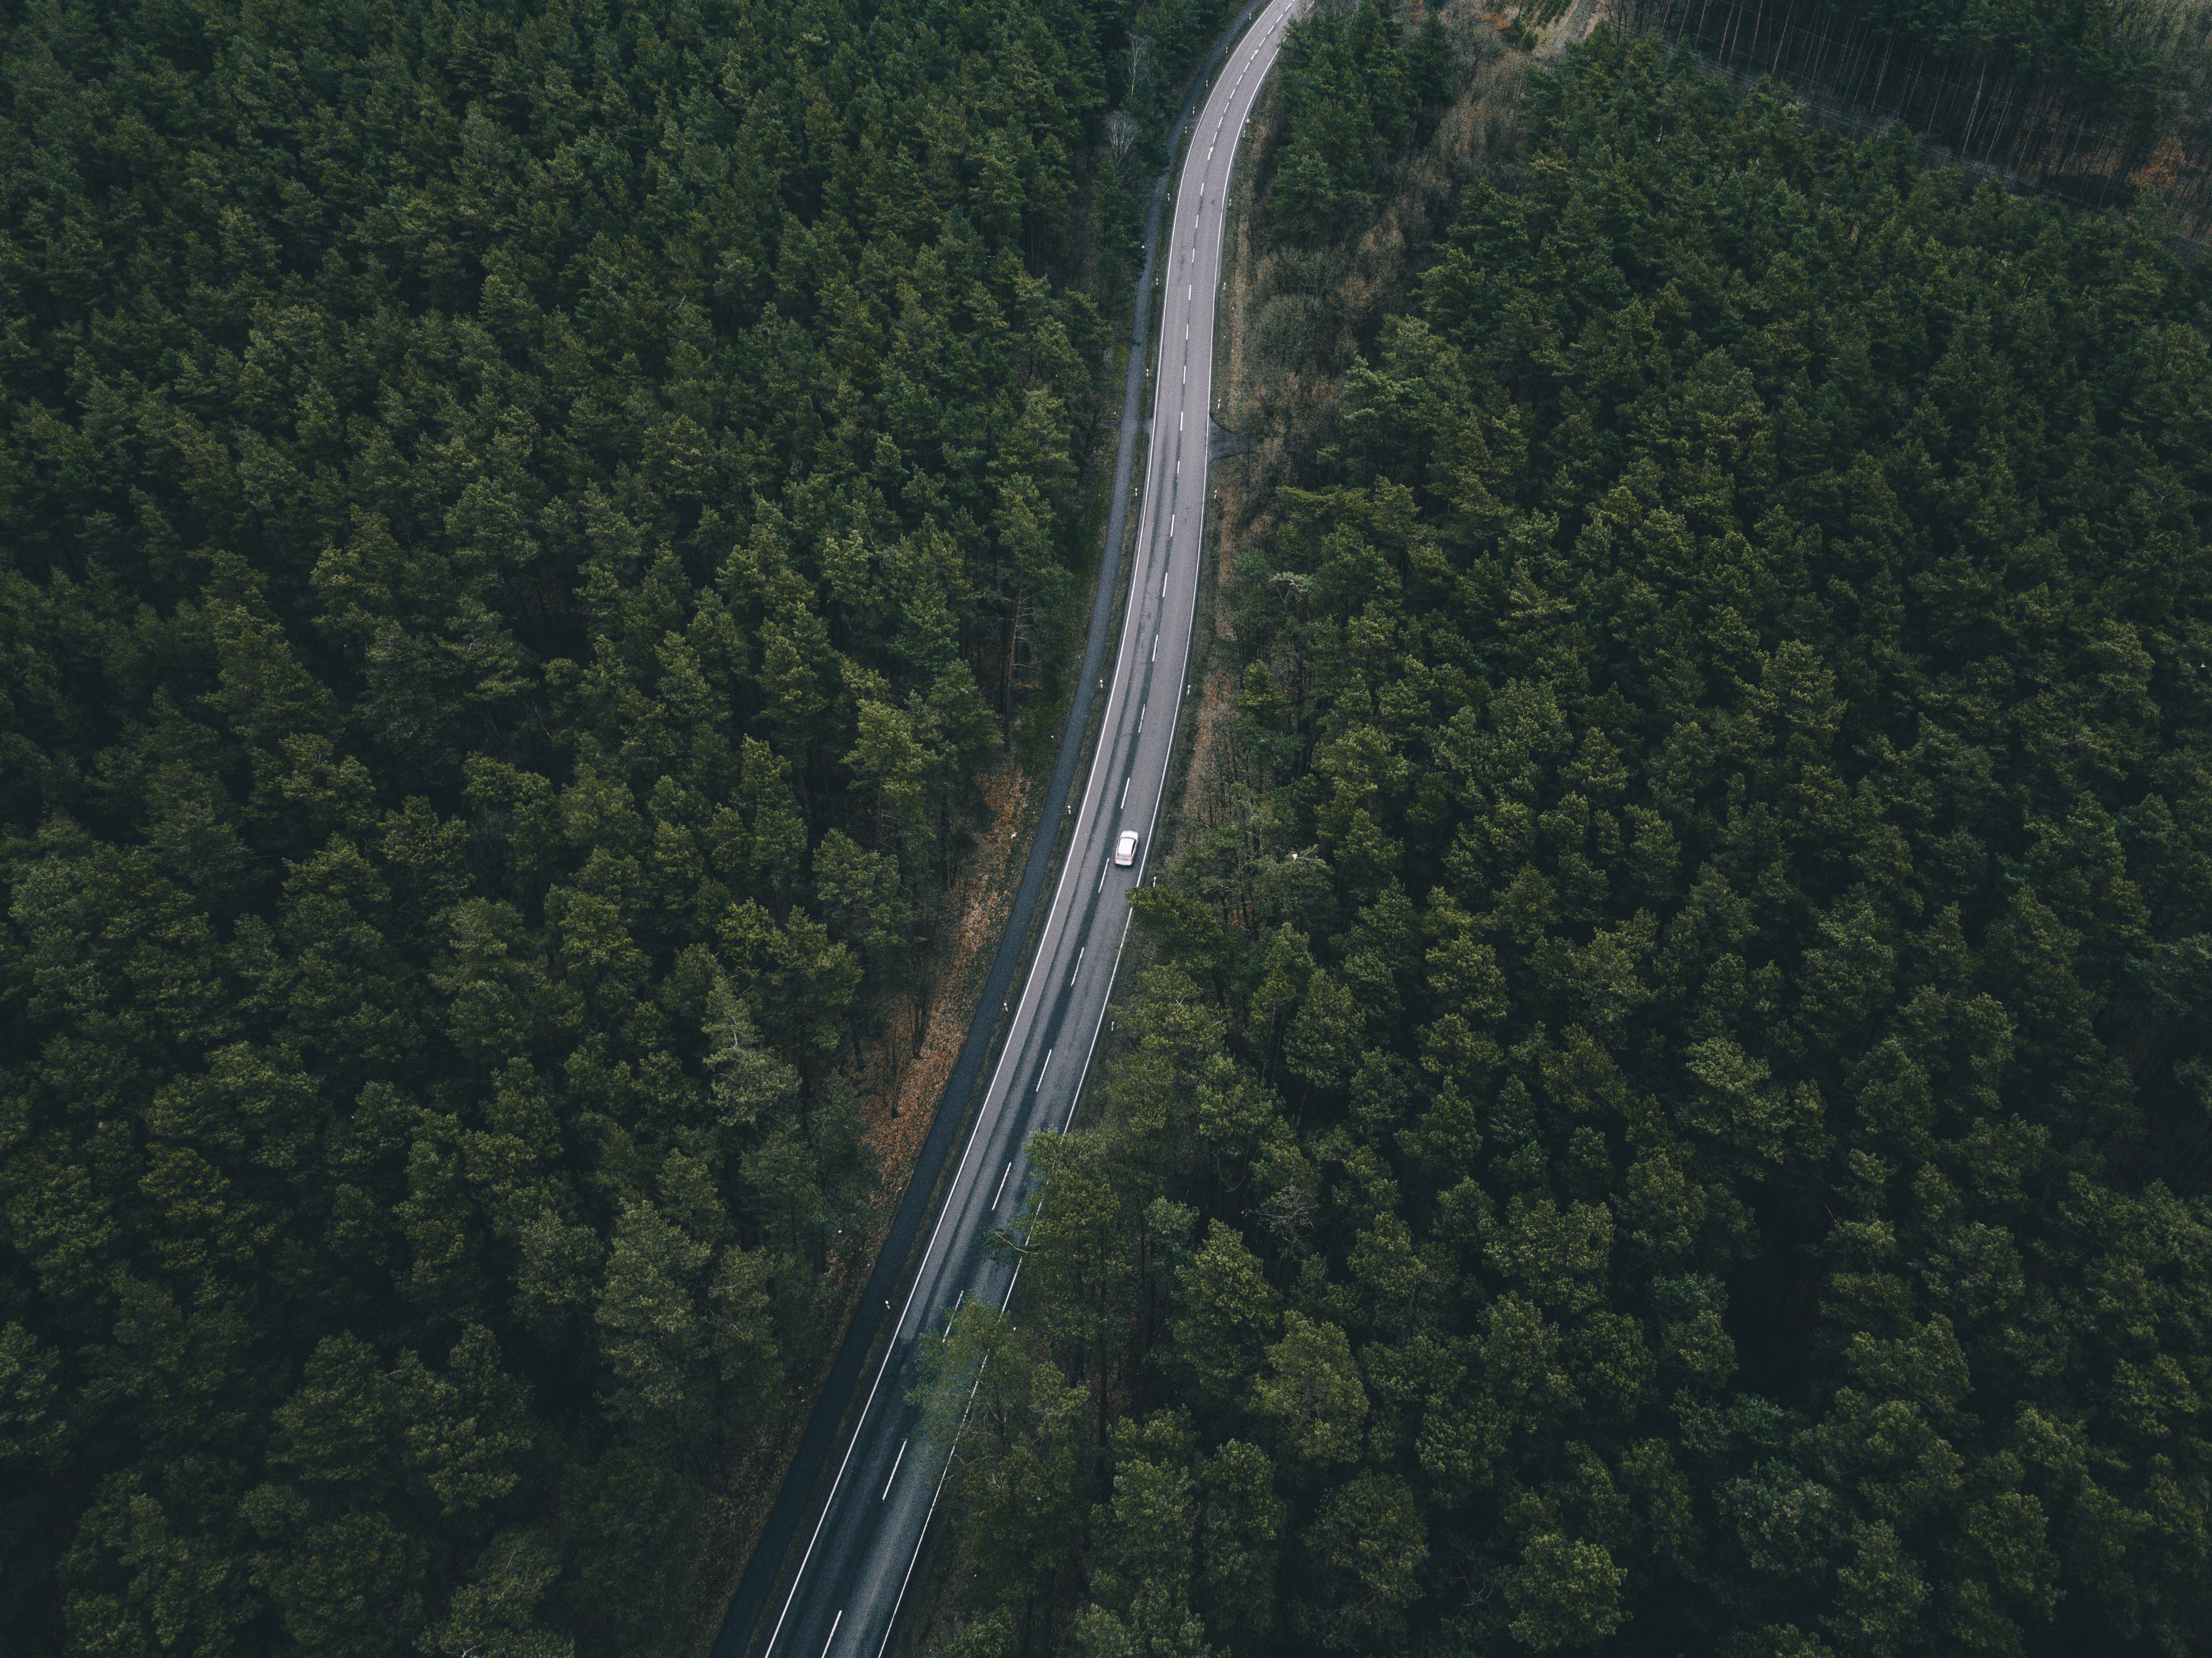 birds eye photography of white vehicle on road